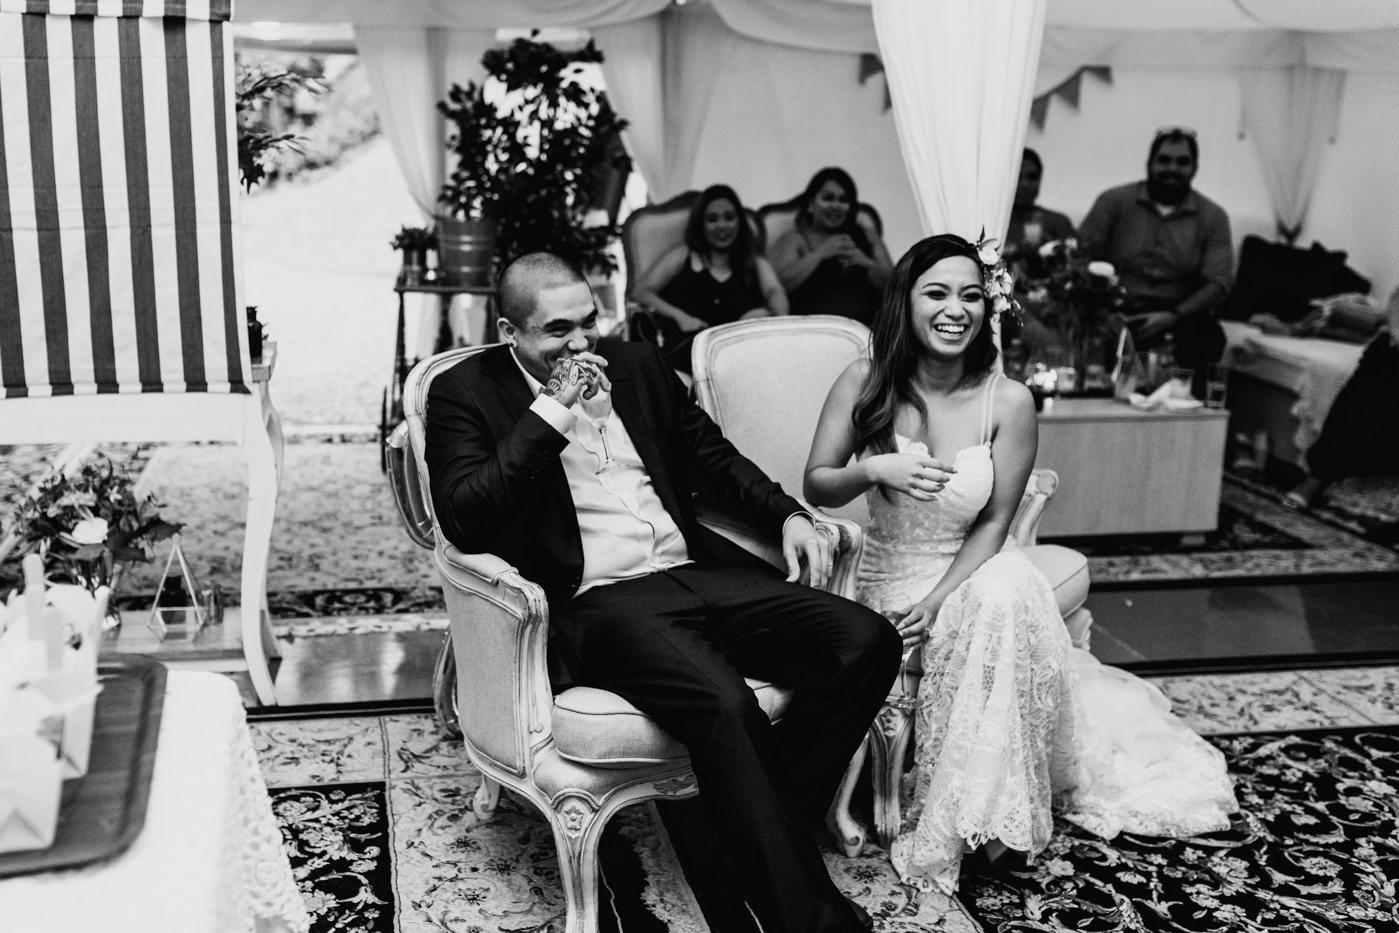 Nick & Vanezza - Fernbank Farm Wedding - Samantha Heather Photography-147.jpg